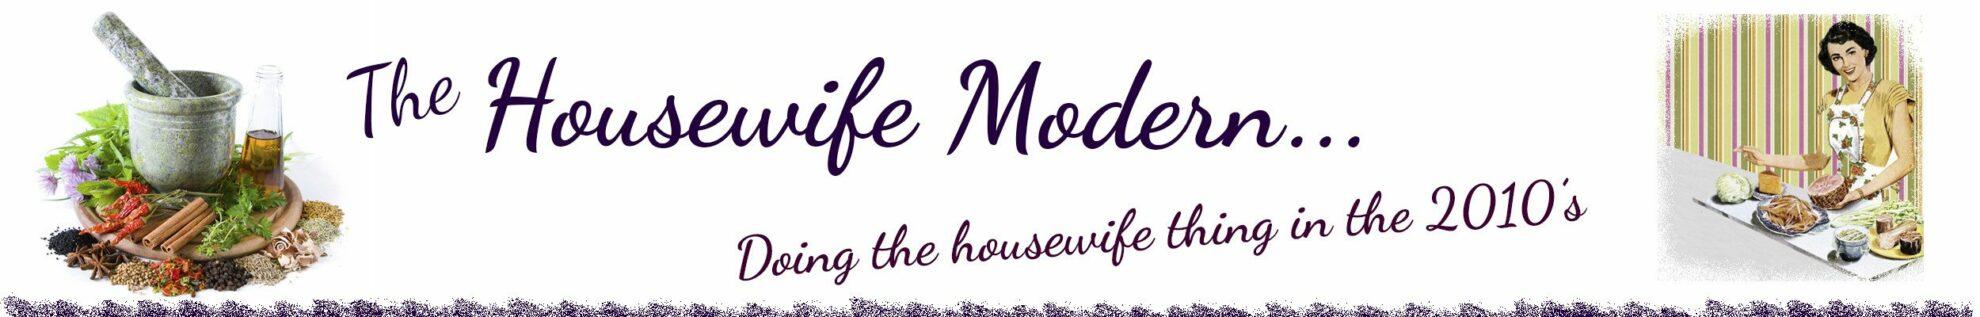 The Housewife Modern